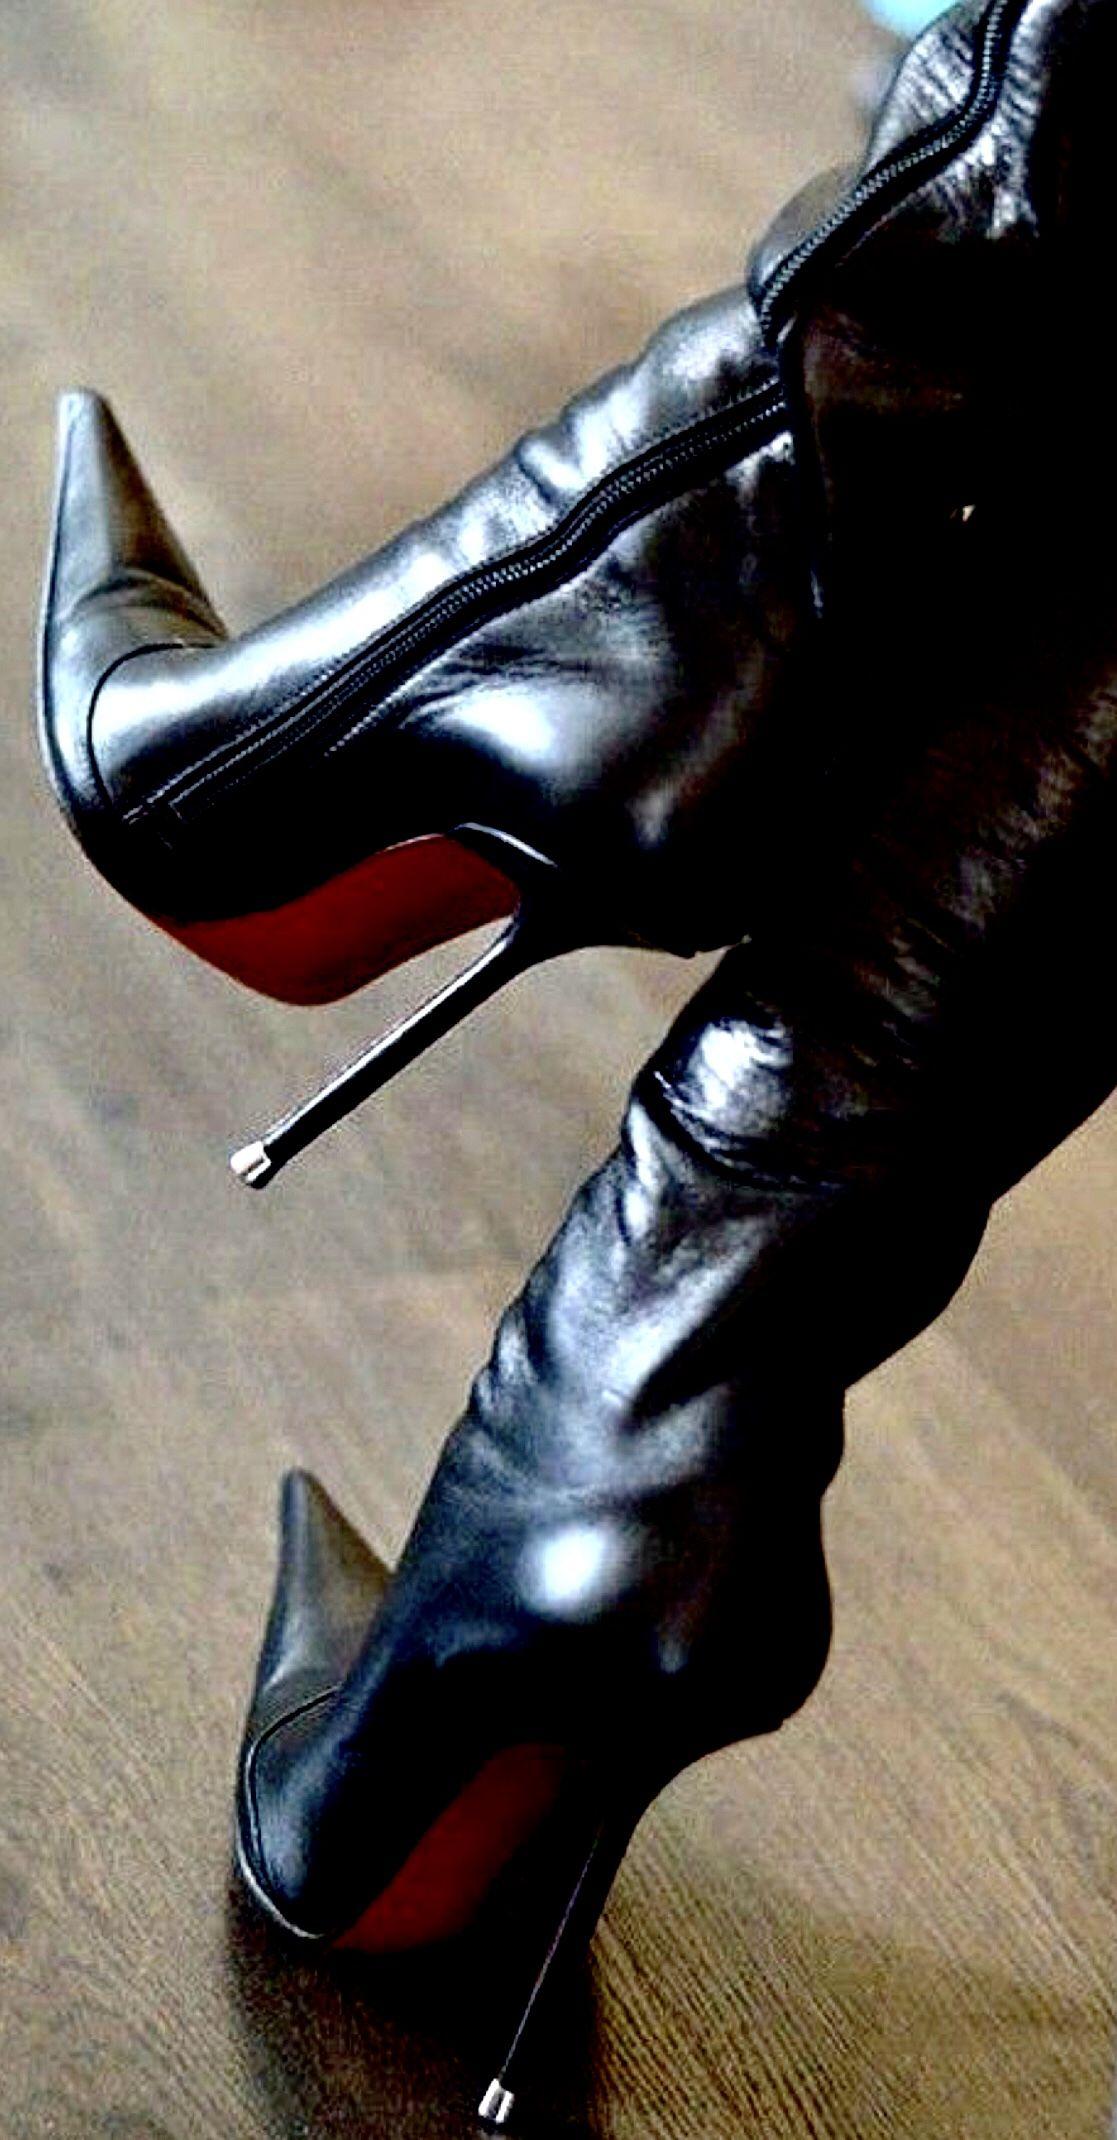 Czarne lesbijki z dużymi butami